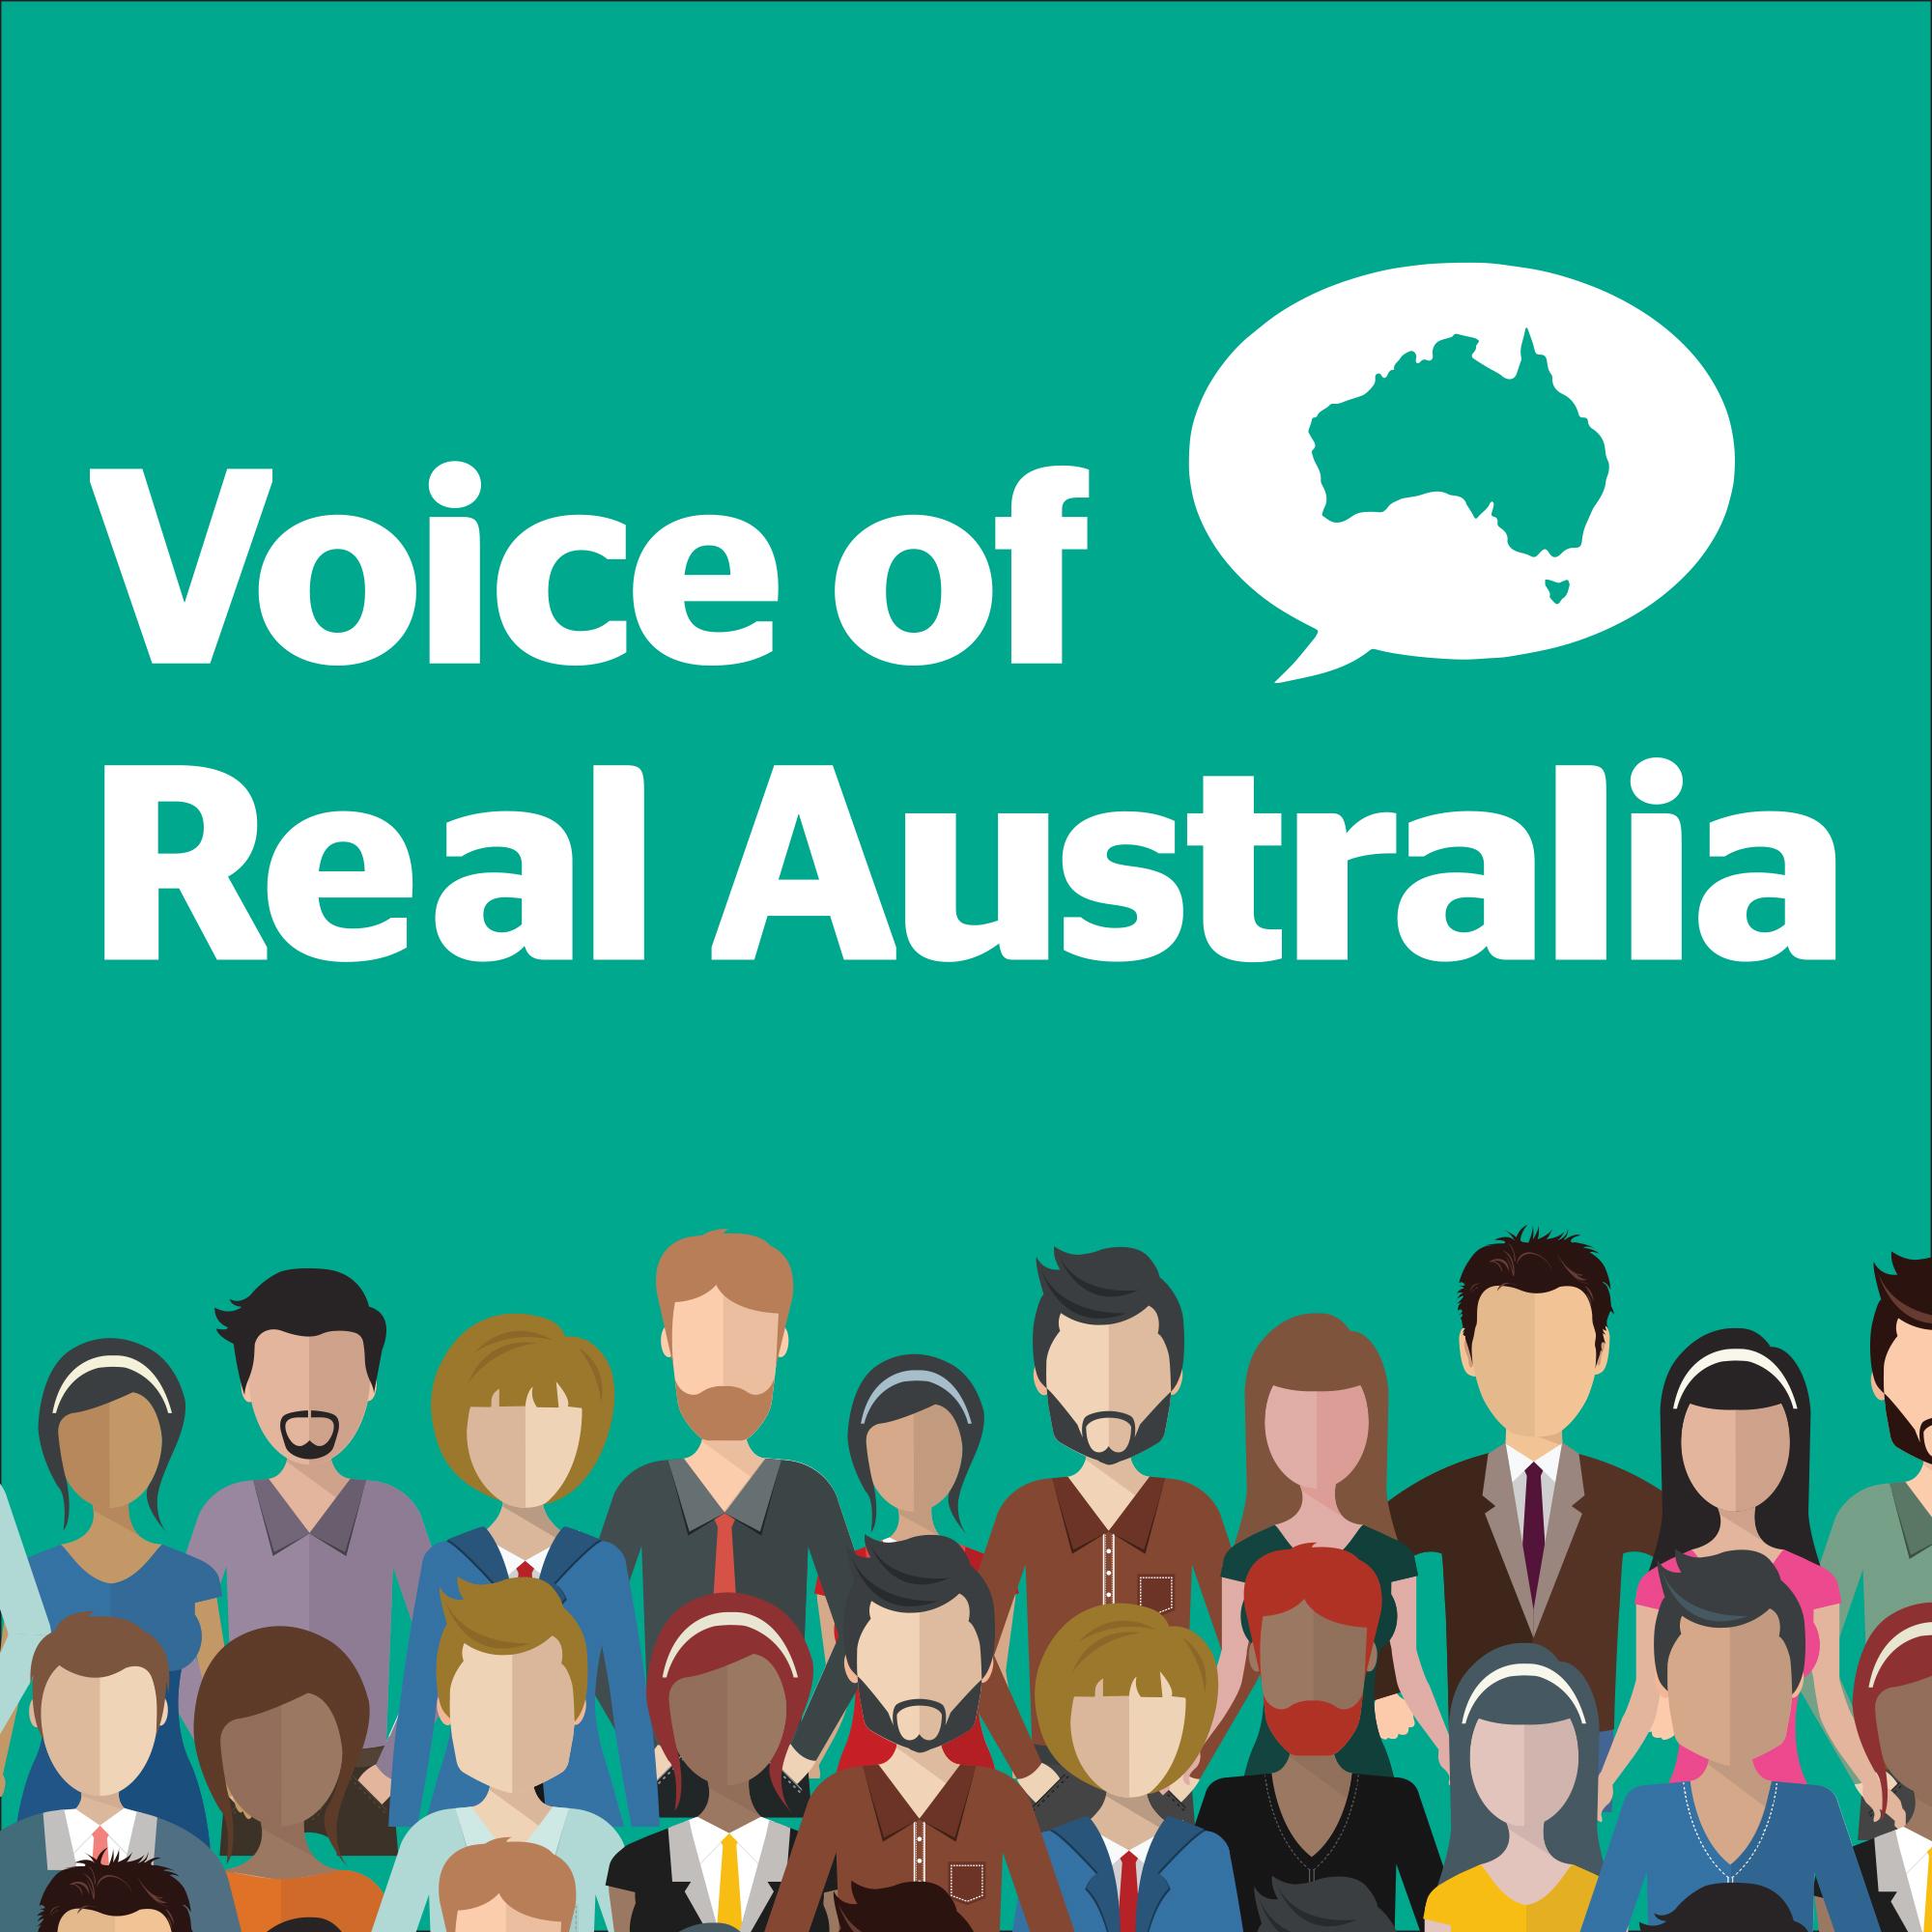 Voice of Real Australia